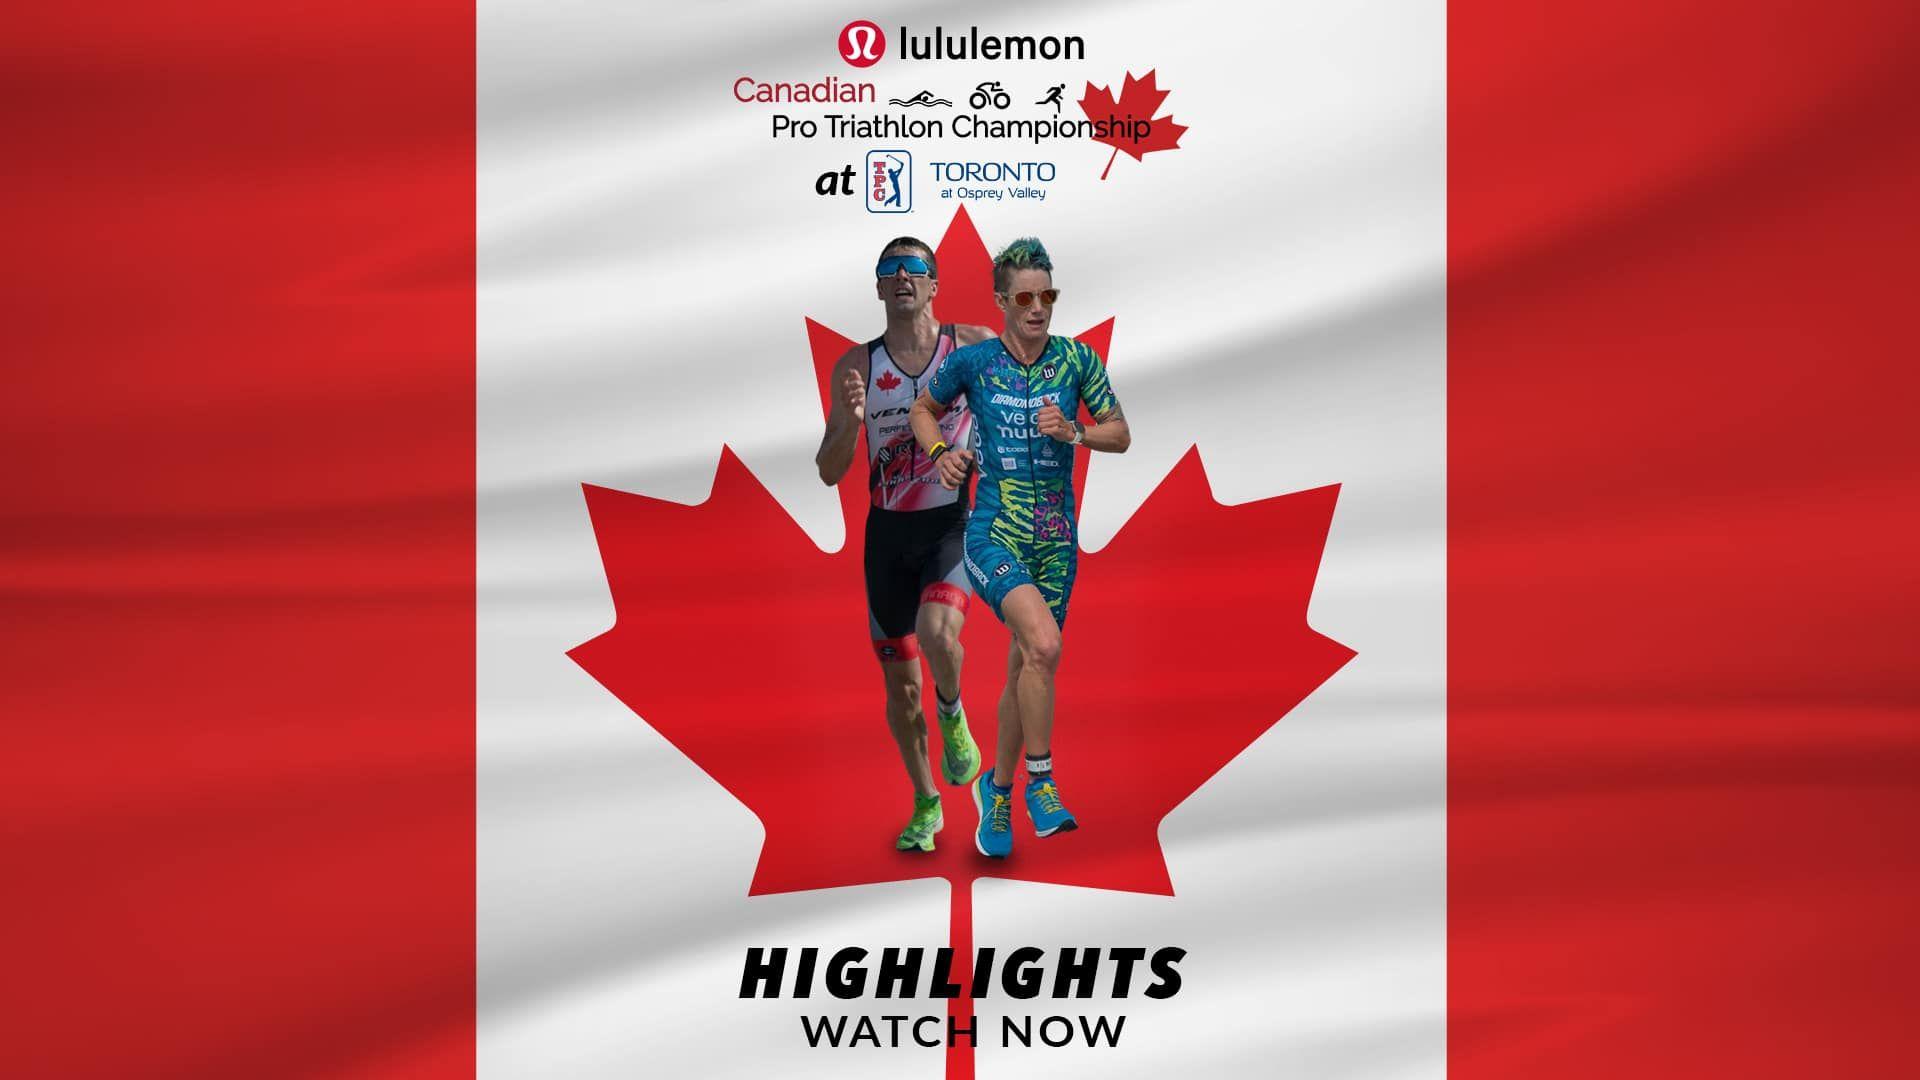 HIGHLIGHTS: lululemon Canadian Pro Triathlon Championship